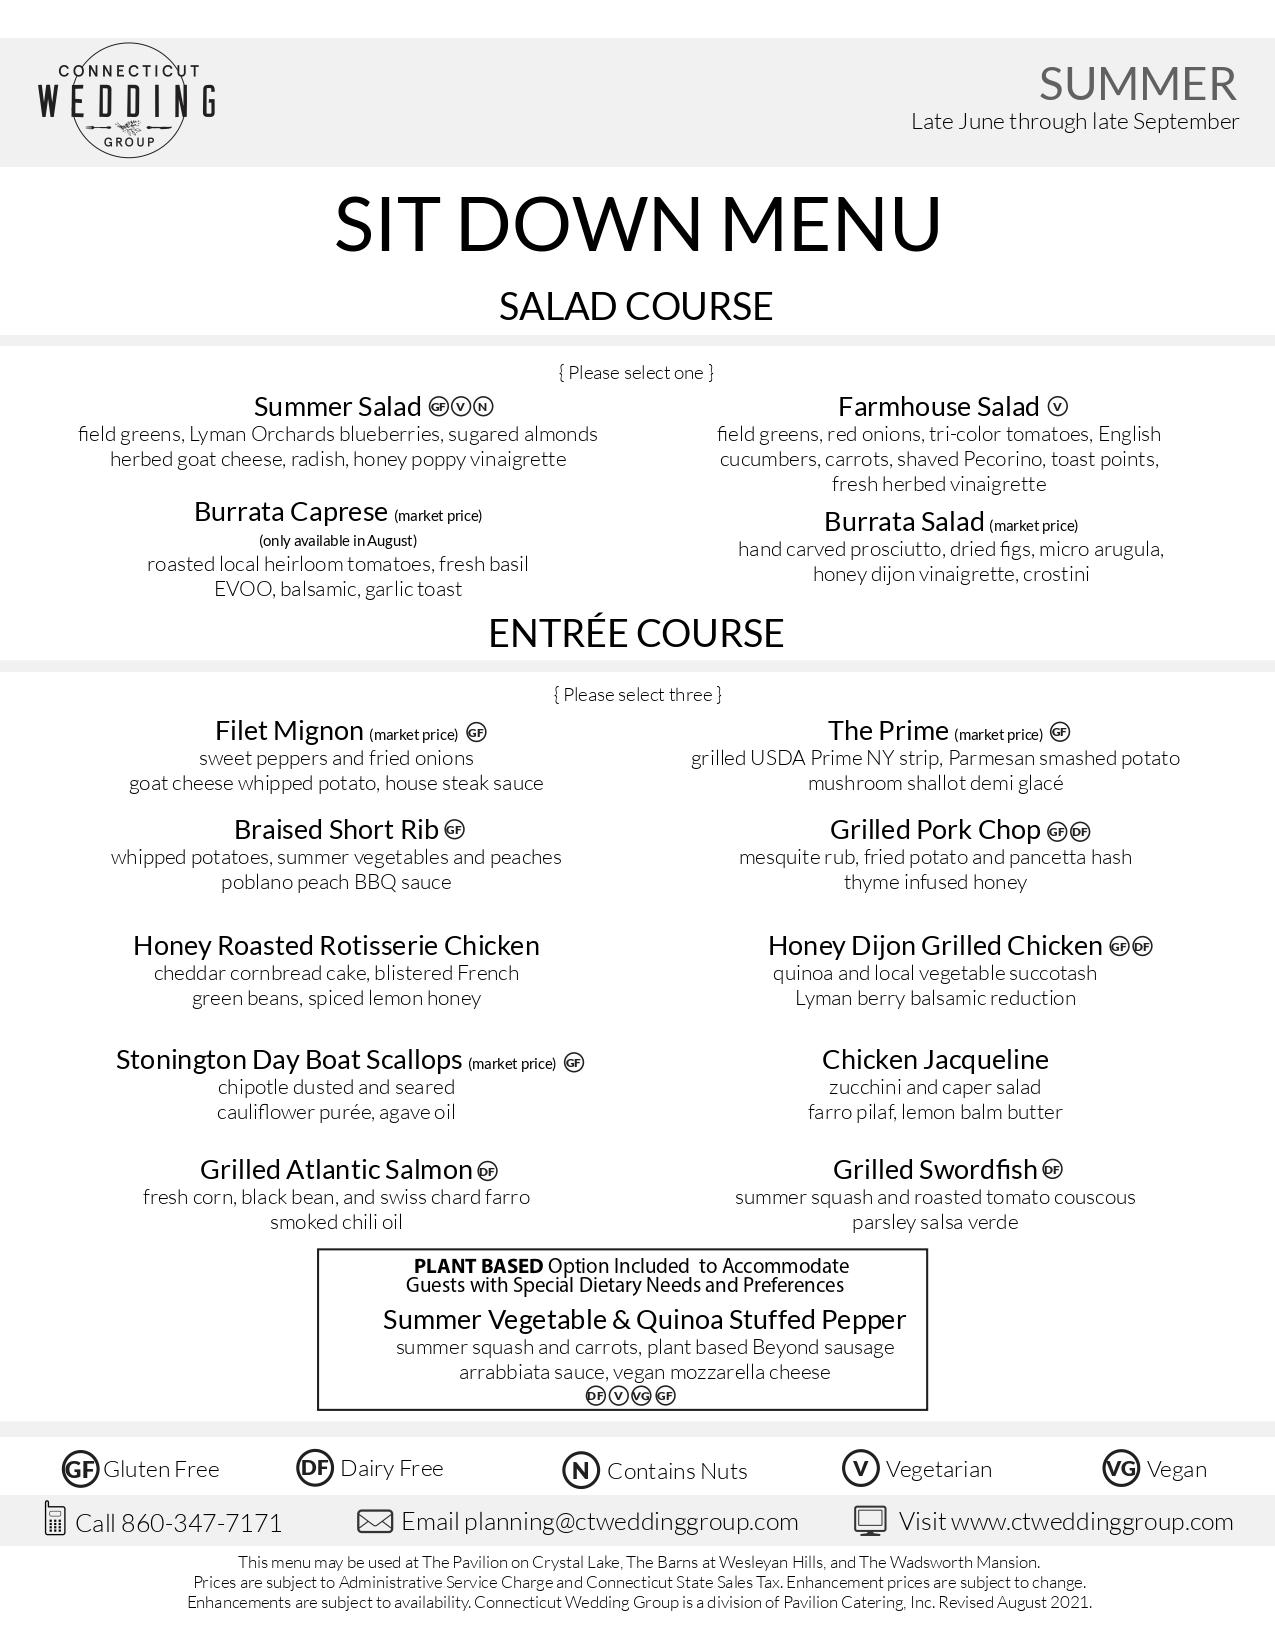 Summer-Sit-Down-Buffet-Menu-2022_page-0001